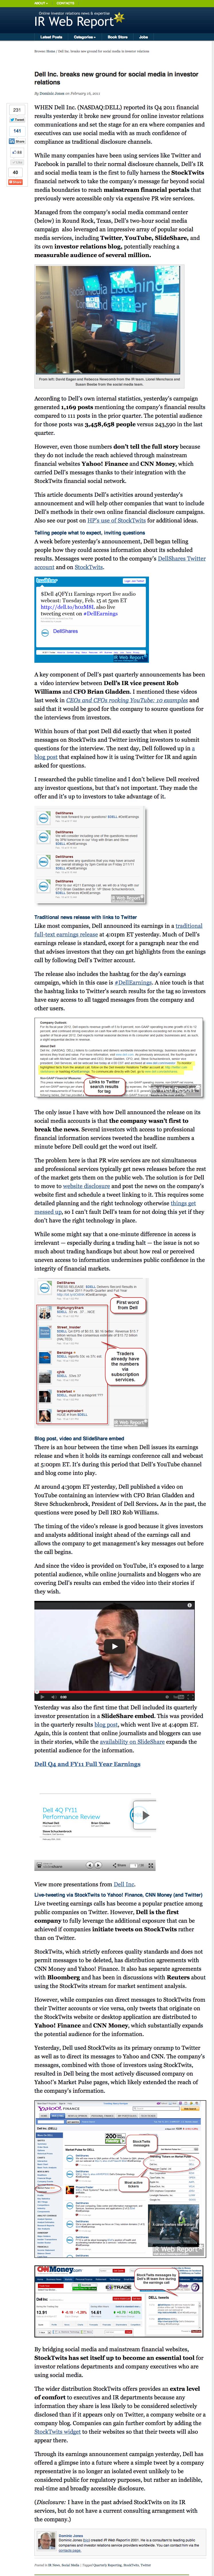 Dell Inc. breaks new ground for social media in investor relations